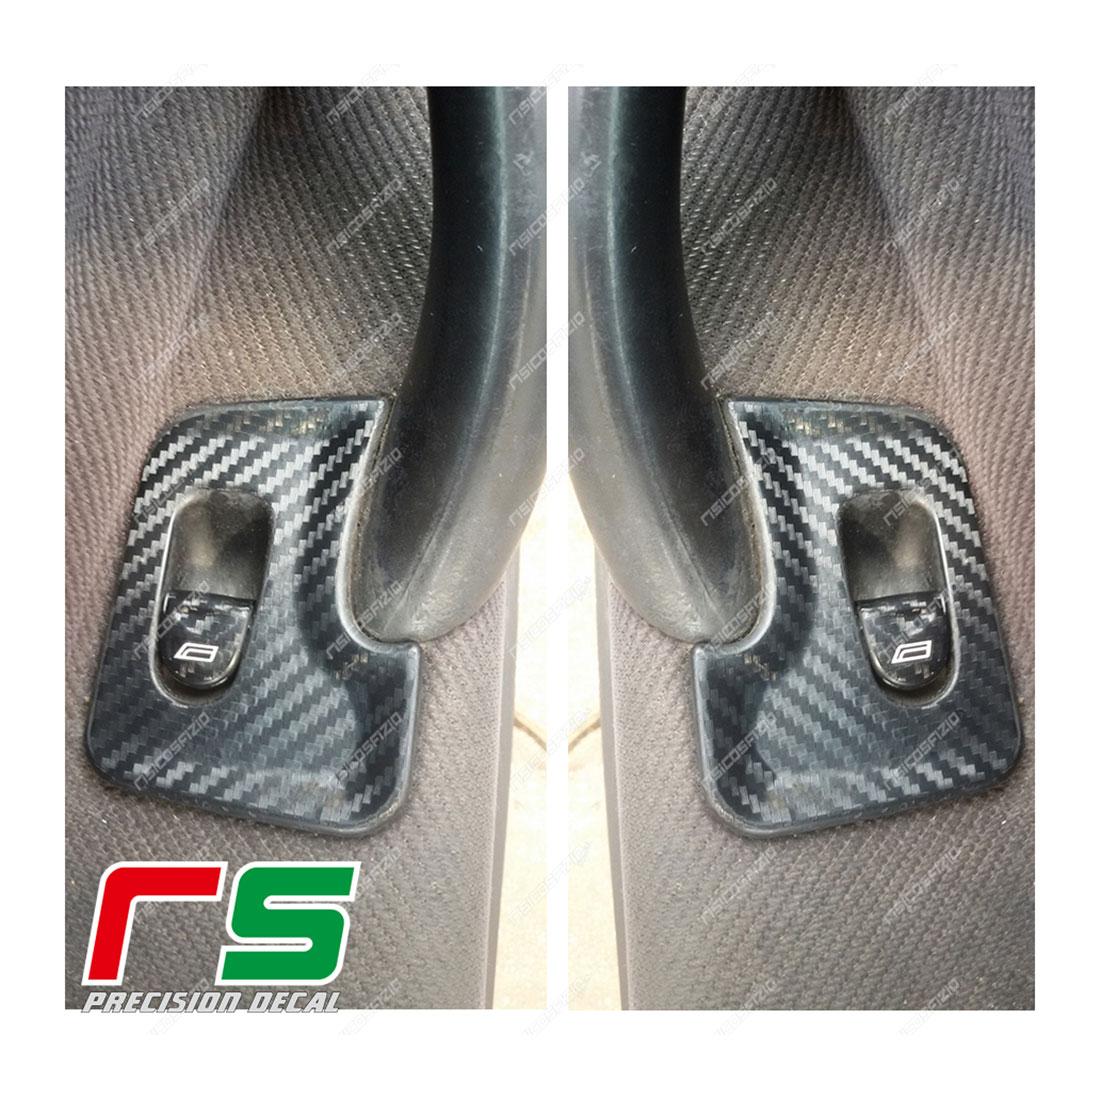 stickers Alfa Romeo 147 carbonlook Decal rear windows